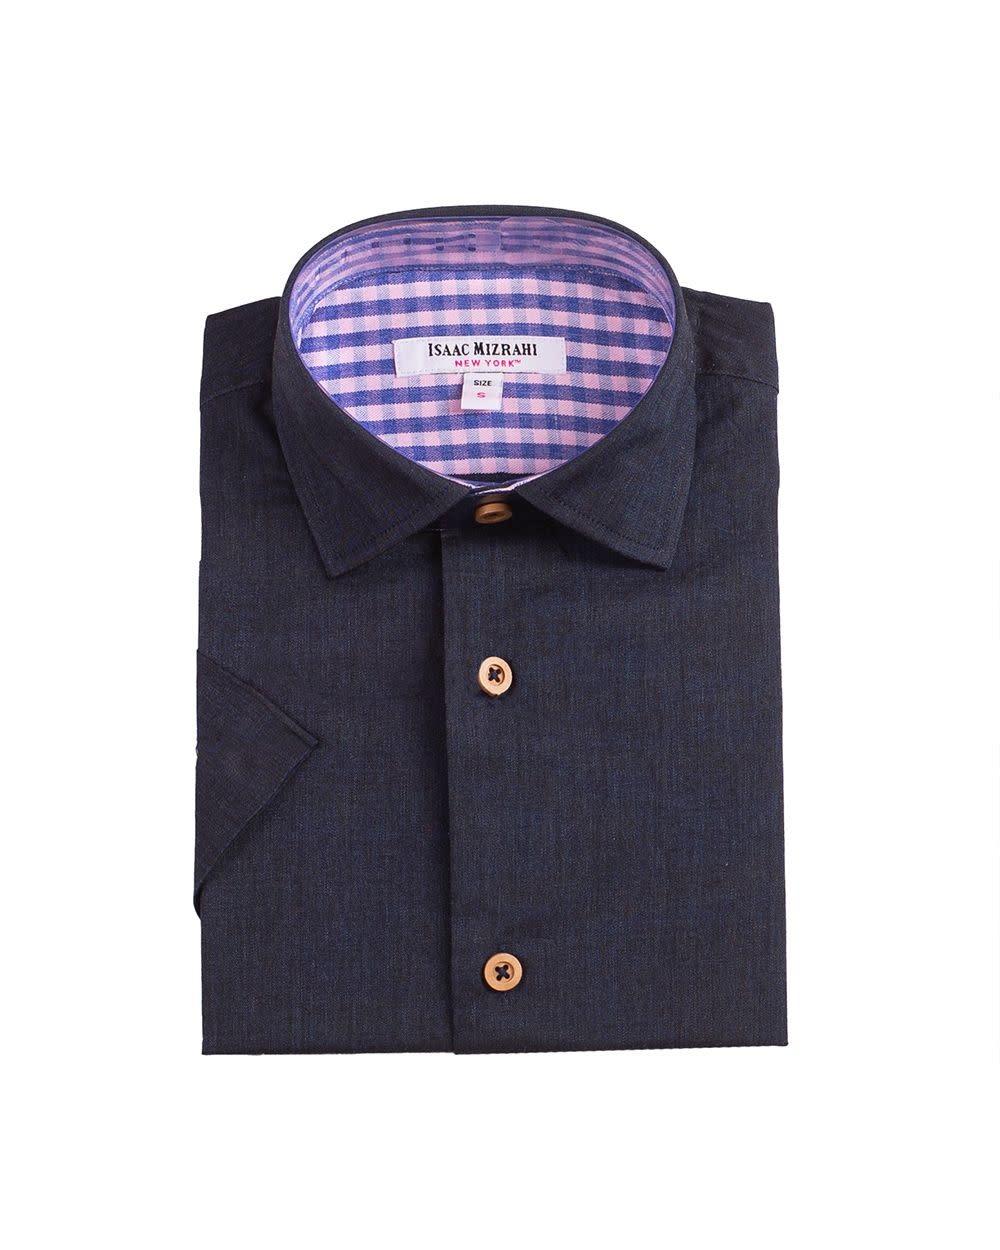 Boys Short Sleeve Dress Shirt - Navy Chambray